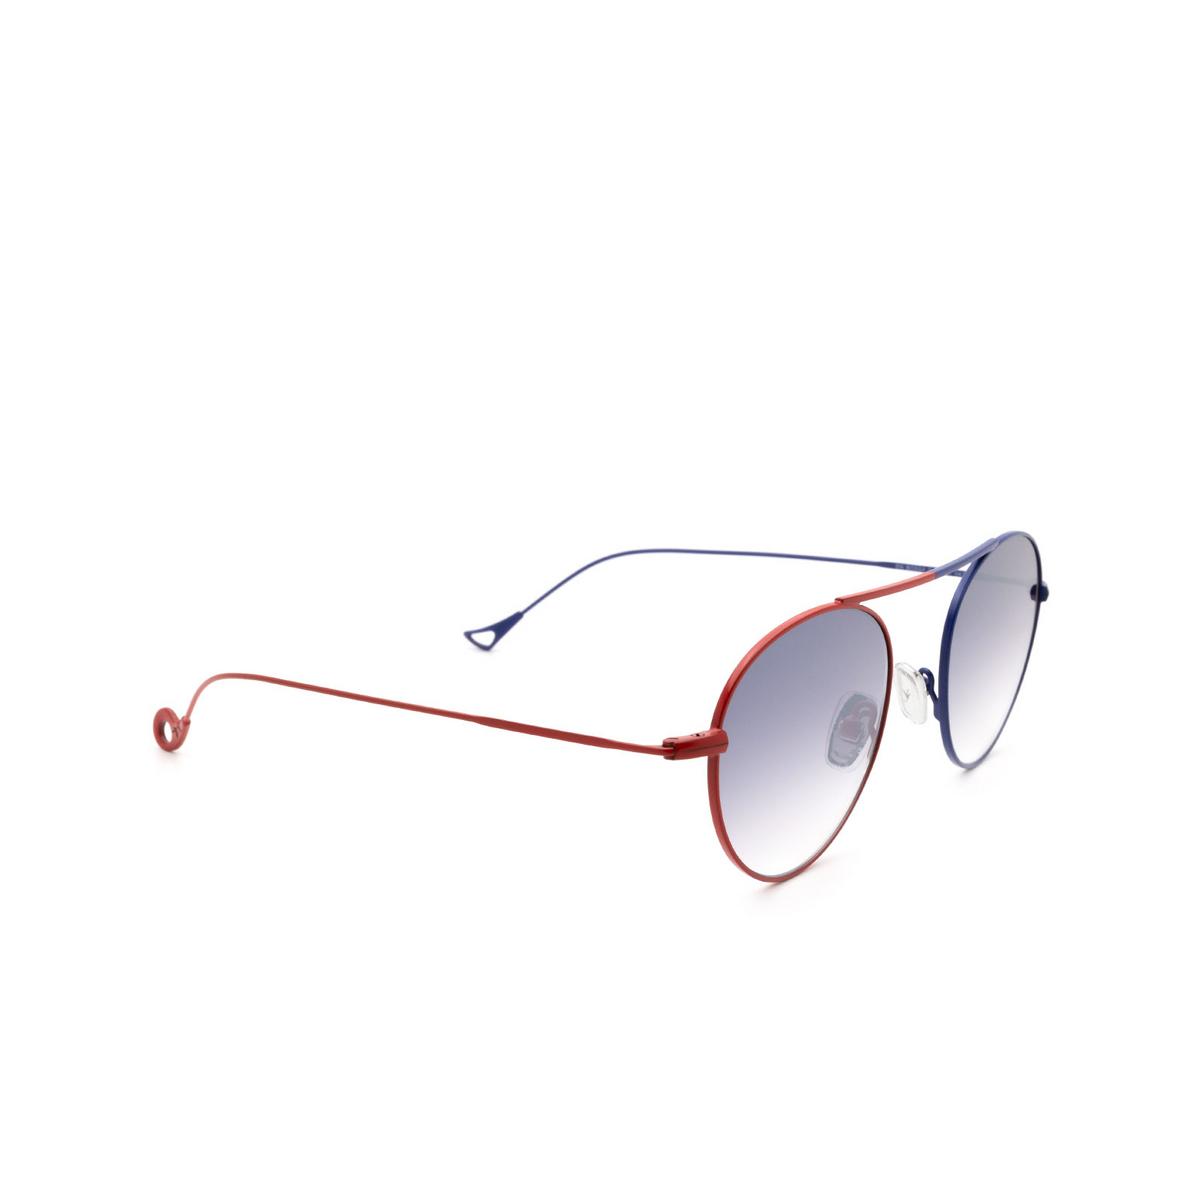 Eyepetizer® Round Sunglasses: En Bossa color Red & Blue C.18-27F - three-quarters view.